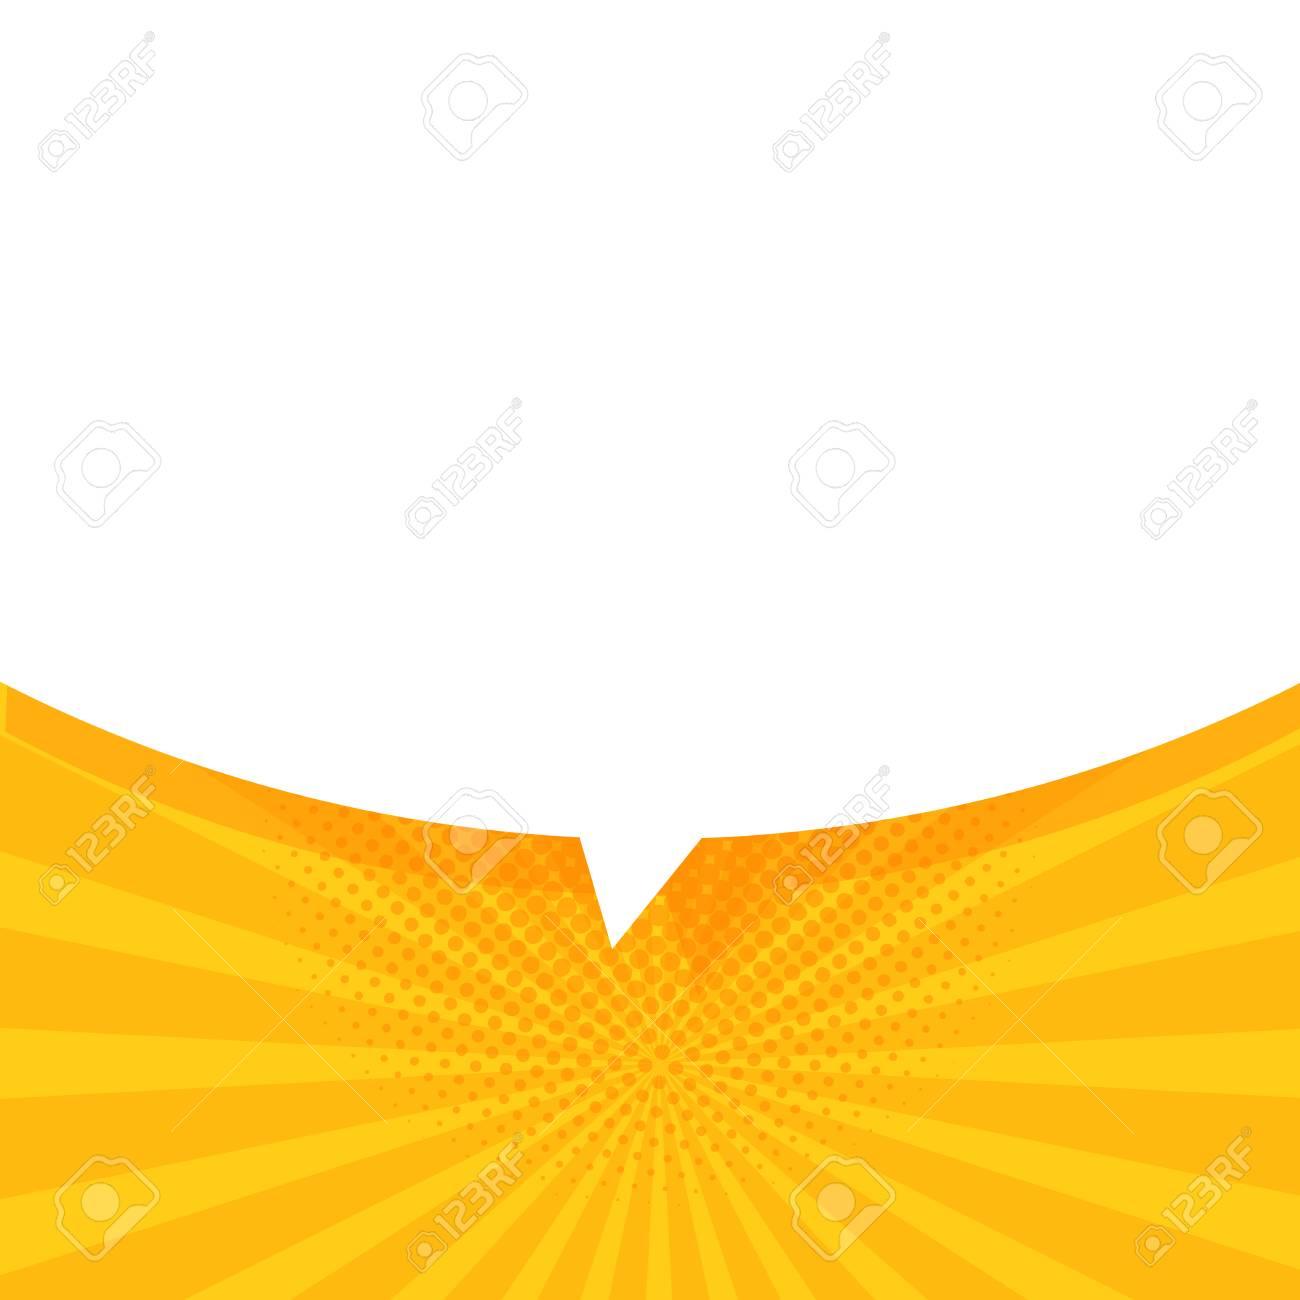 Speech Bubble in Pop Art Style. Vector banner template. - 95587365